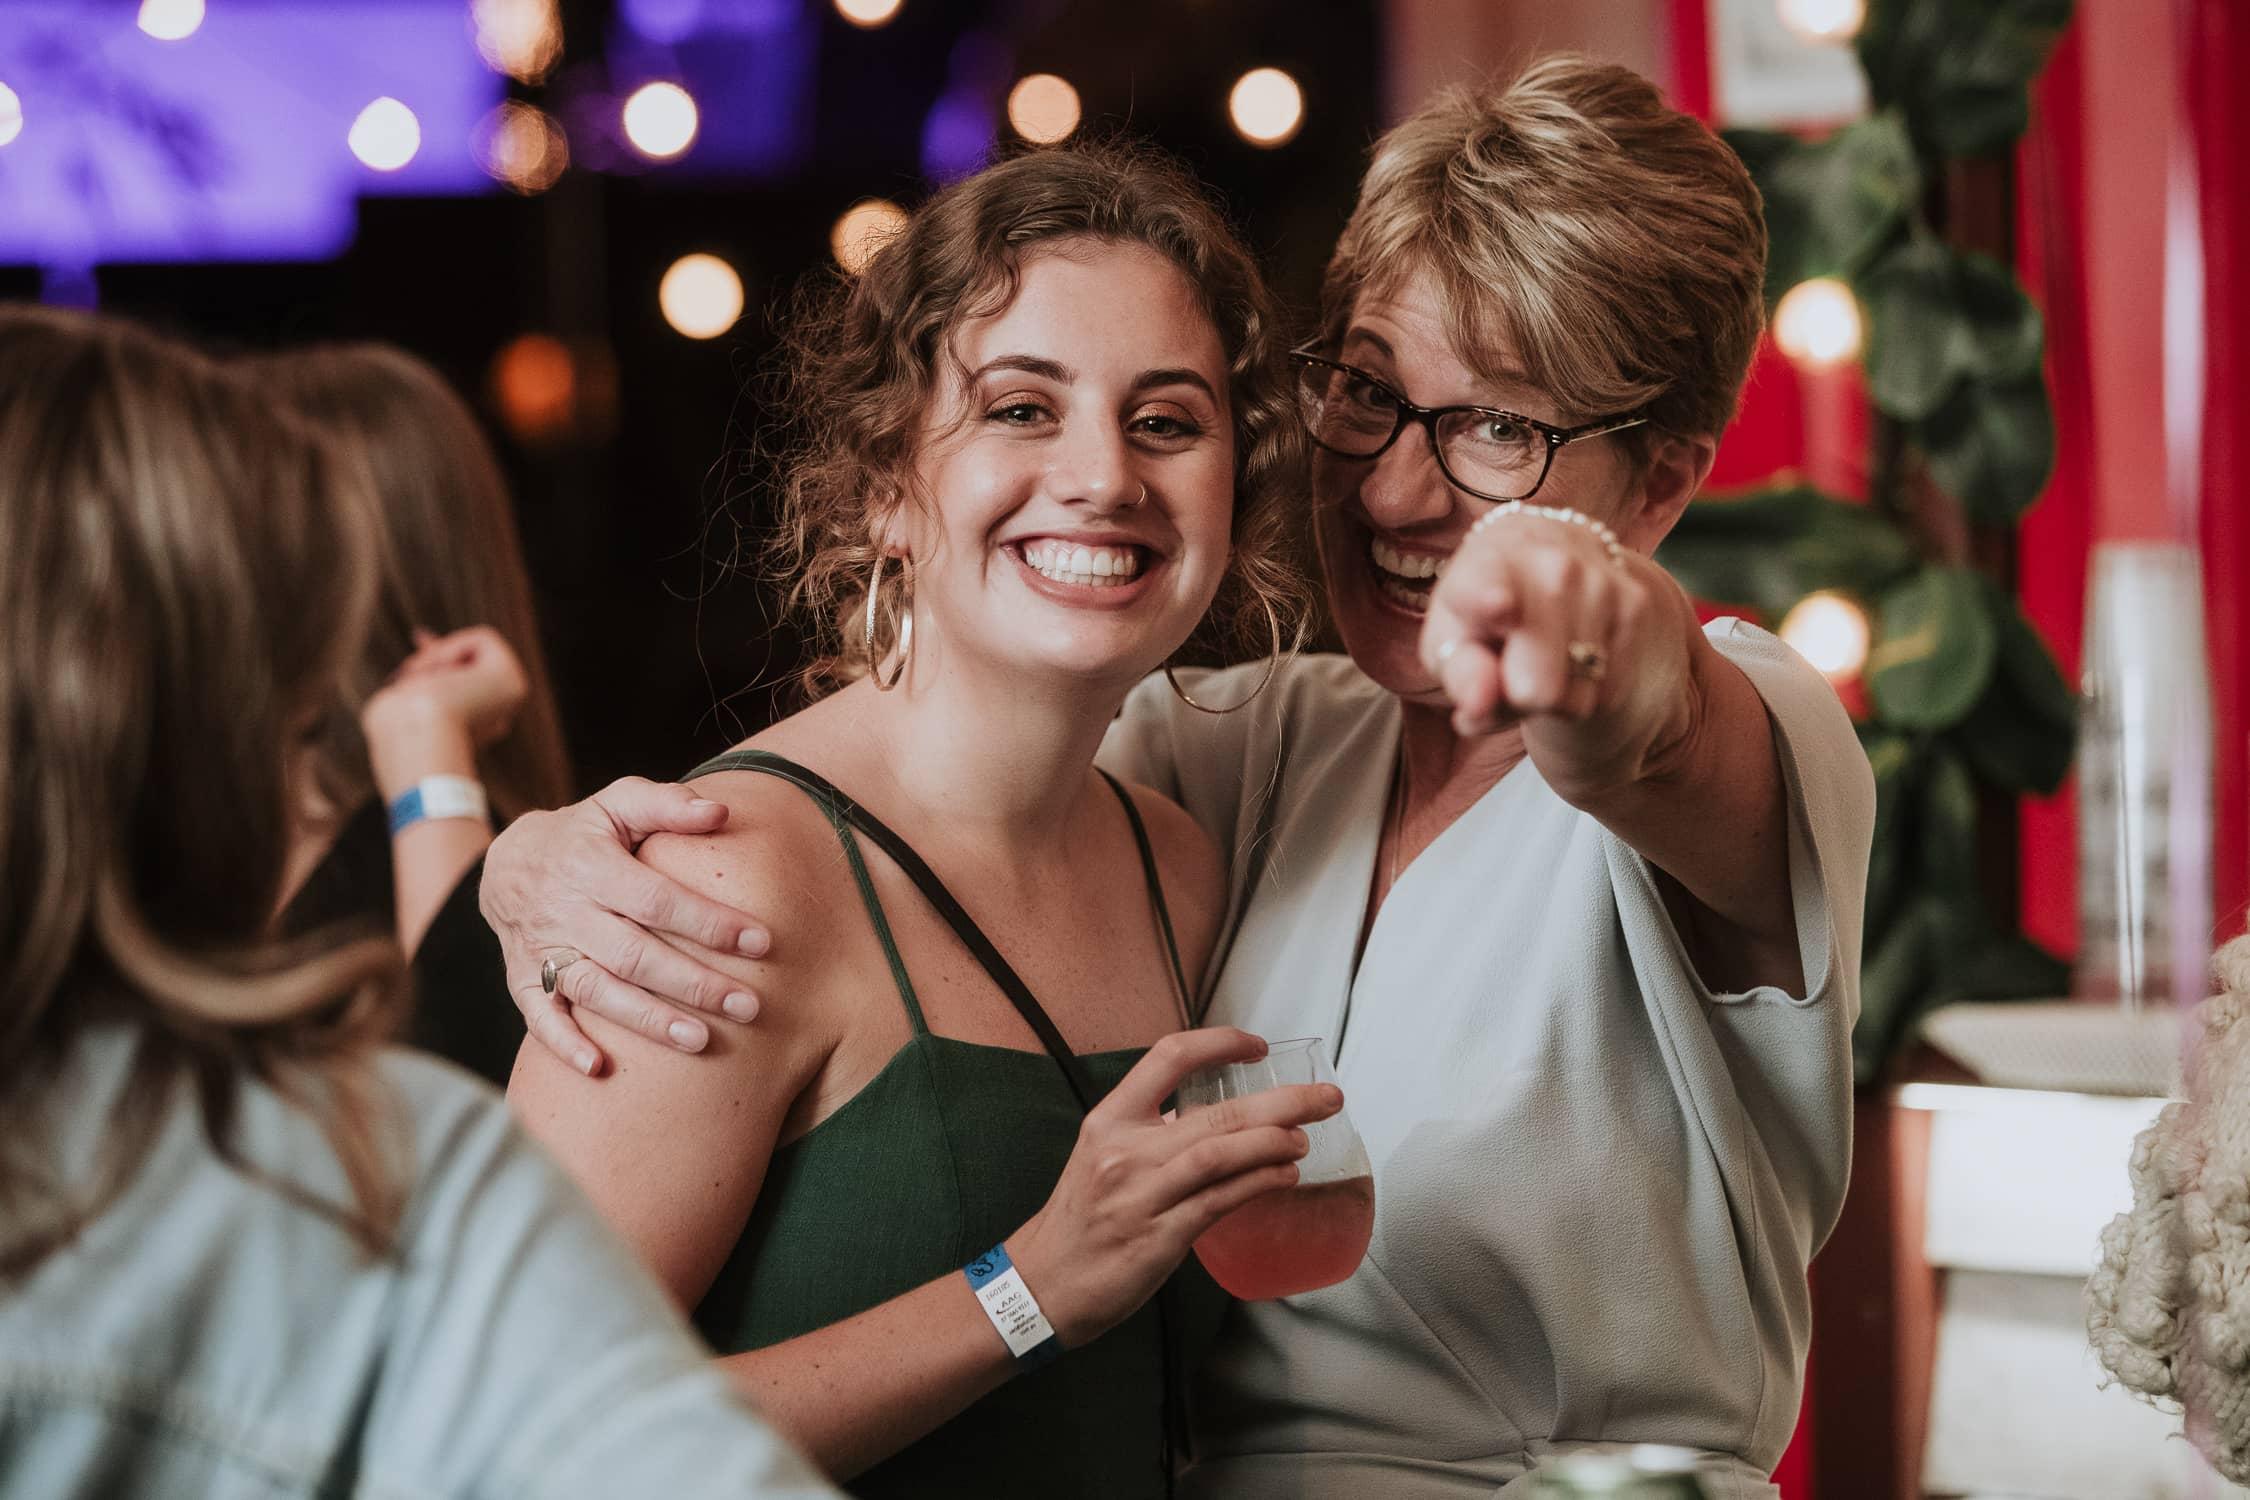 Party Photography Brisbane